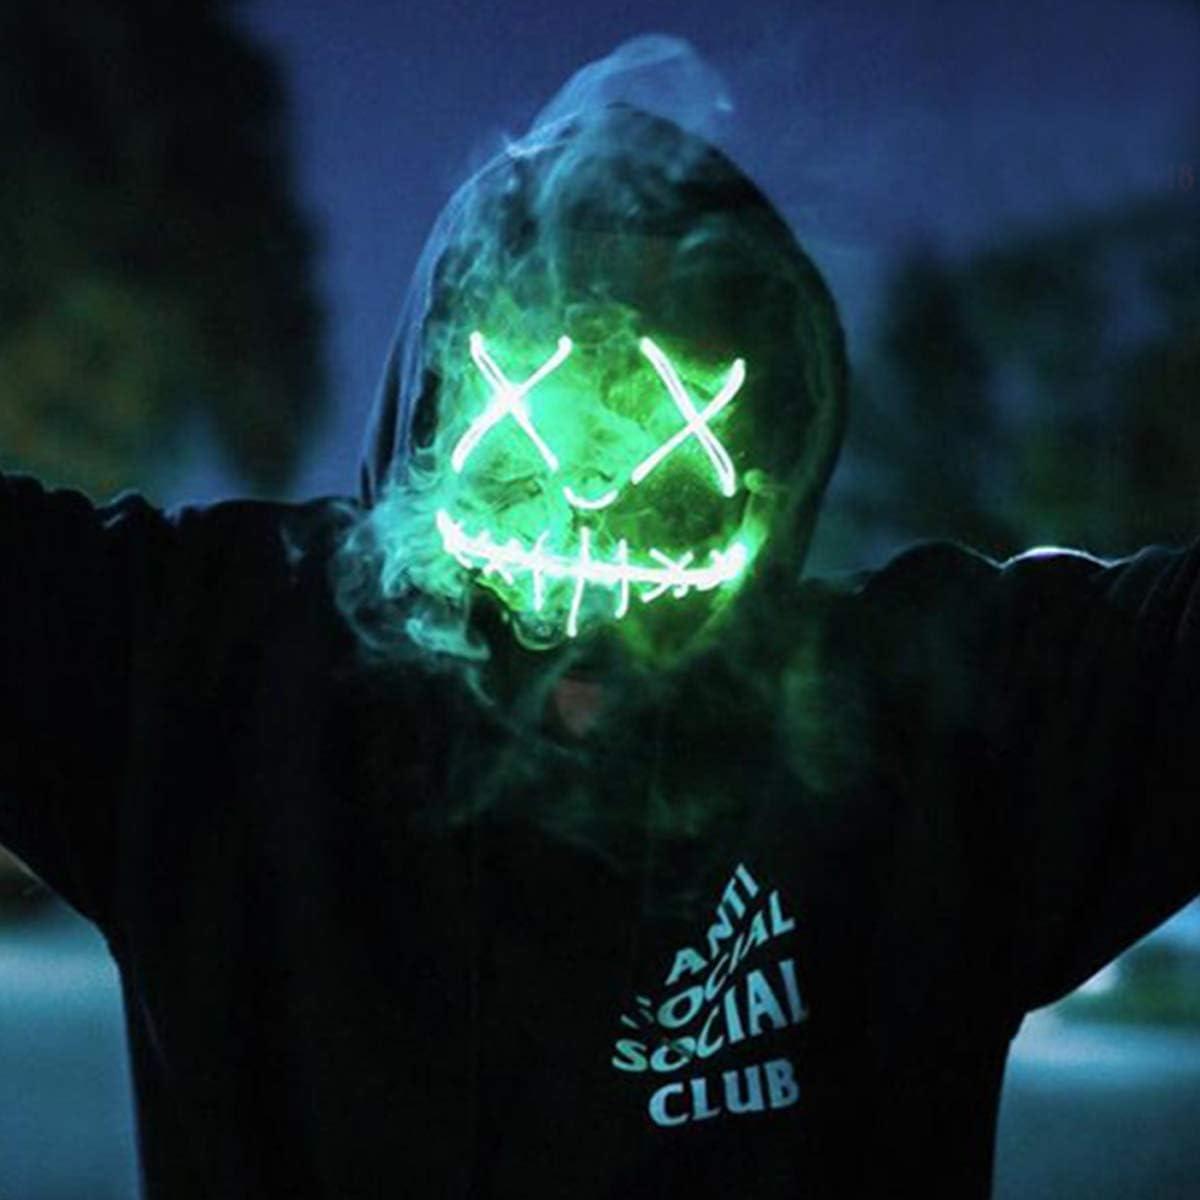 Light up Mask Led Mask Halloween Mask Led Mask Light up Mask Scary Mask for Festival Cosplay Halloween Costume Party